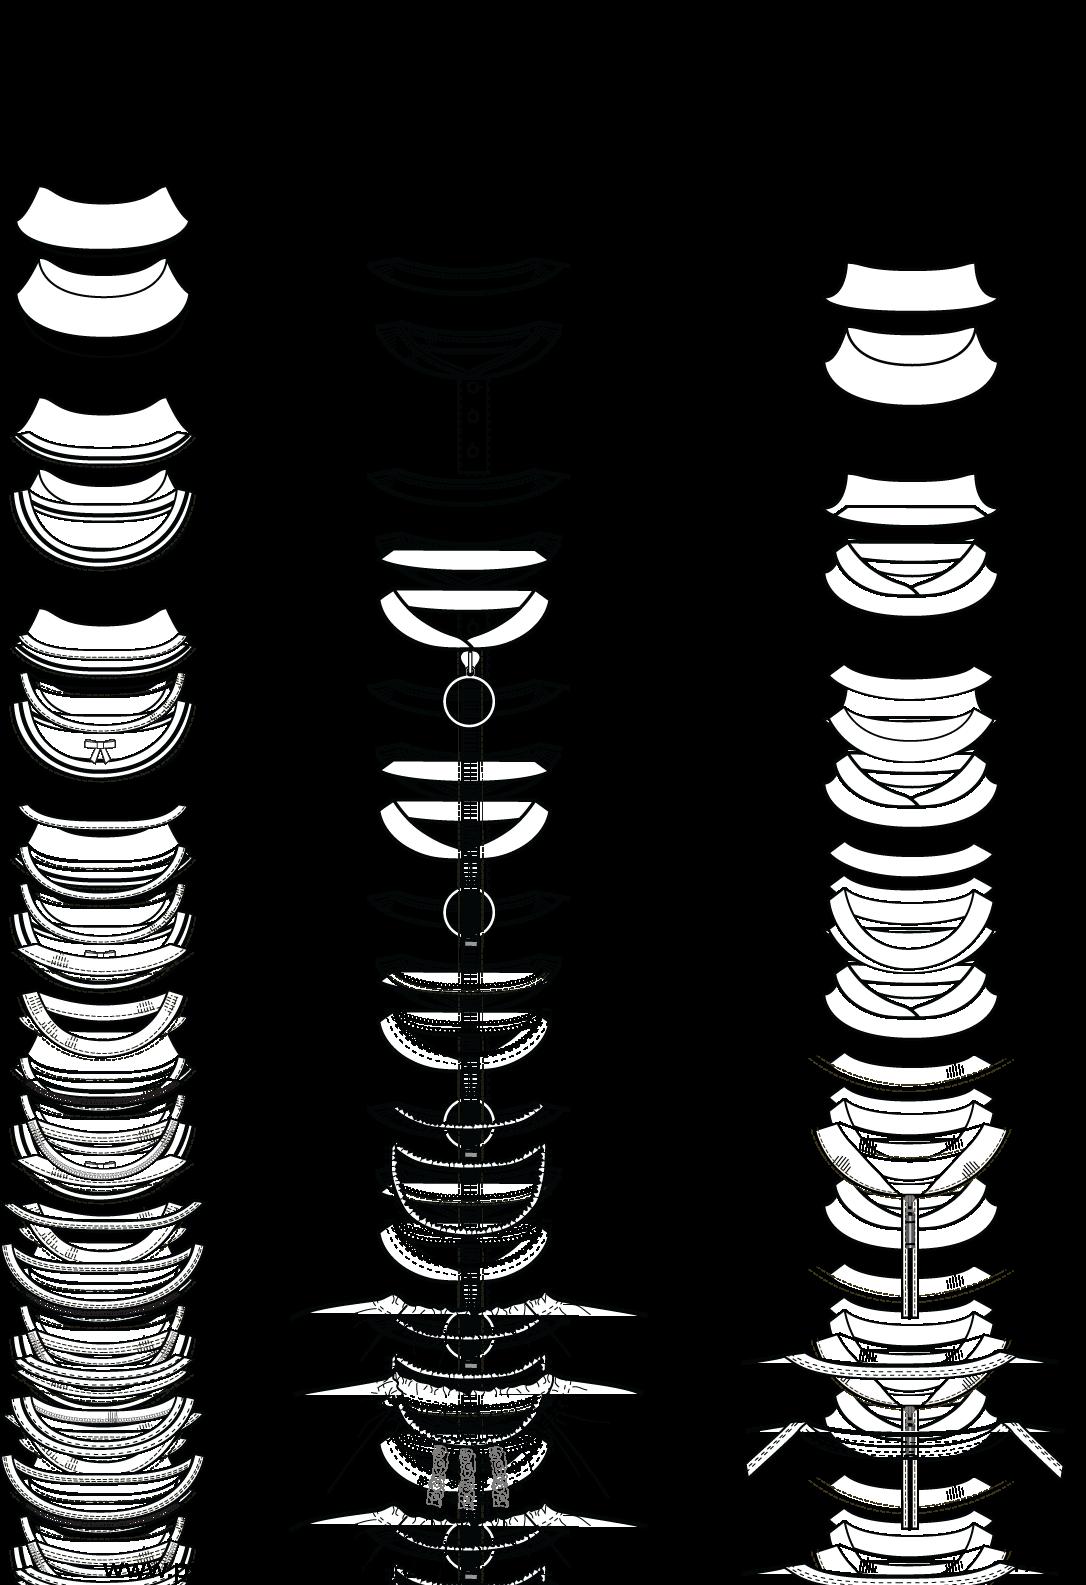 Neckline Drawing : Image description flat fashion illustrations pinterest